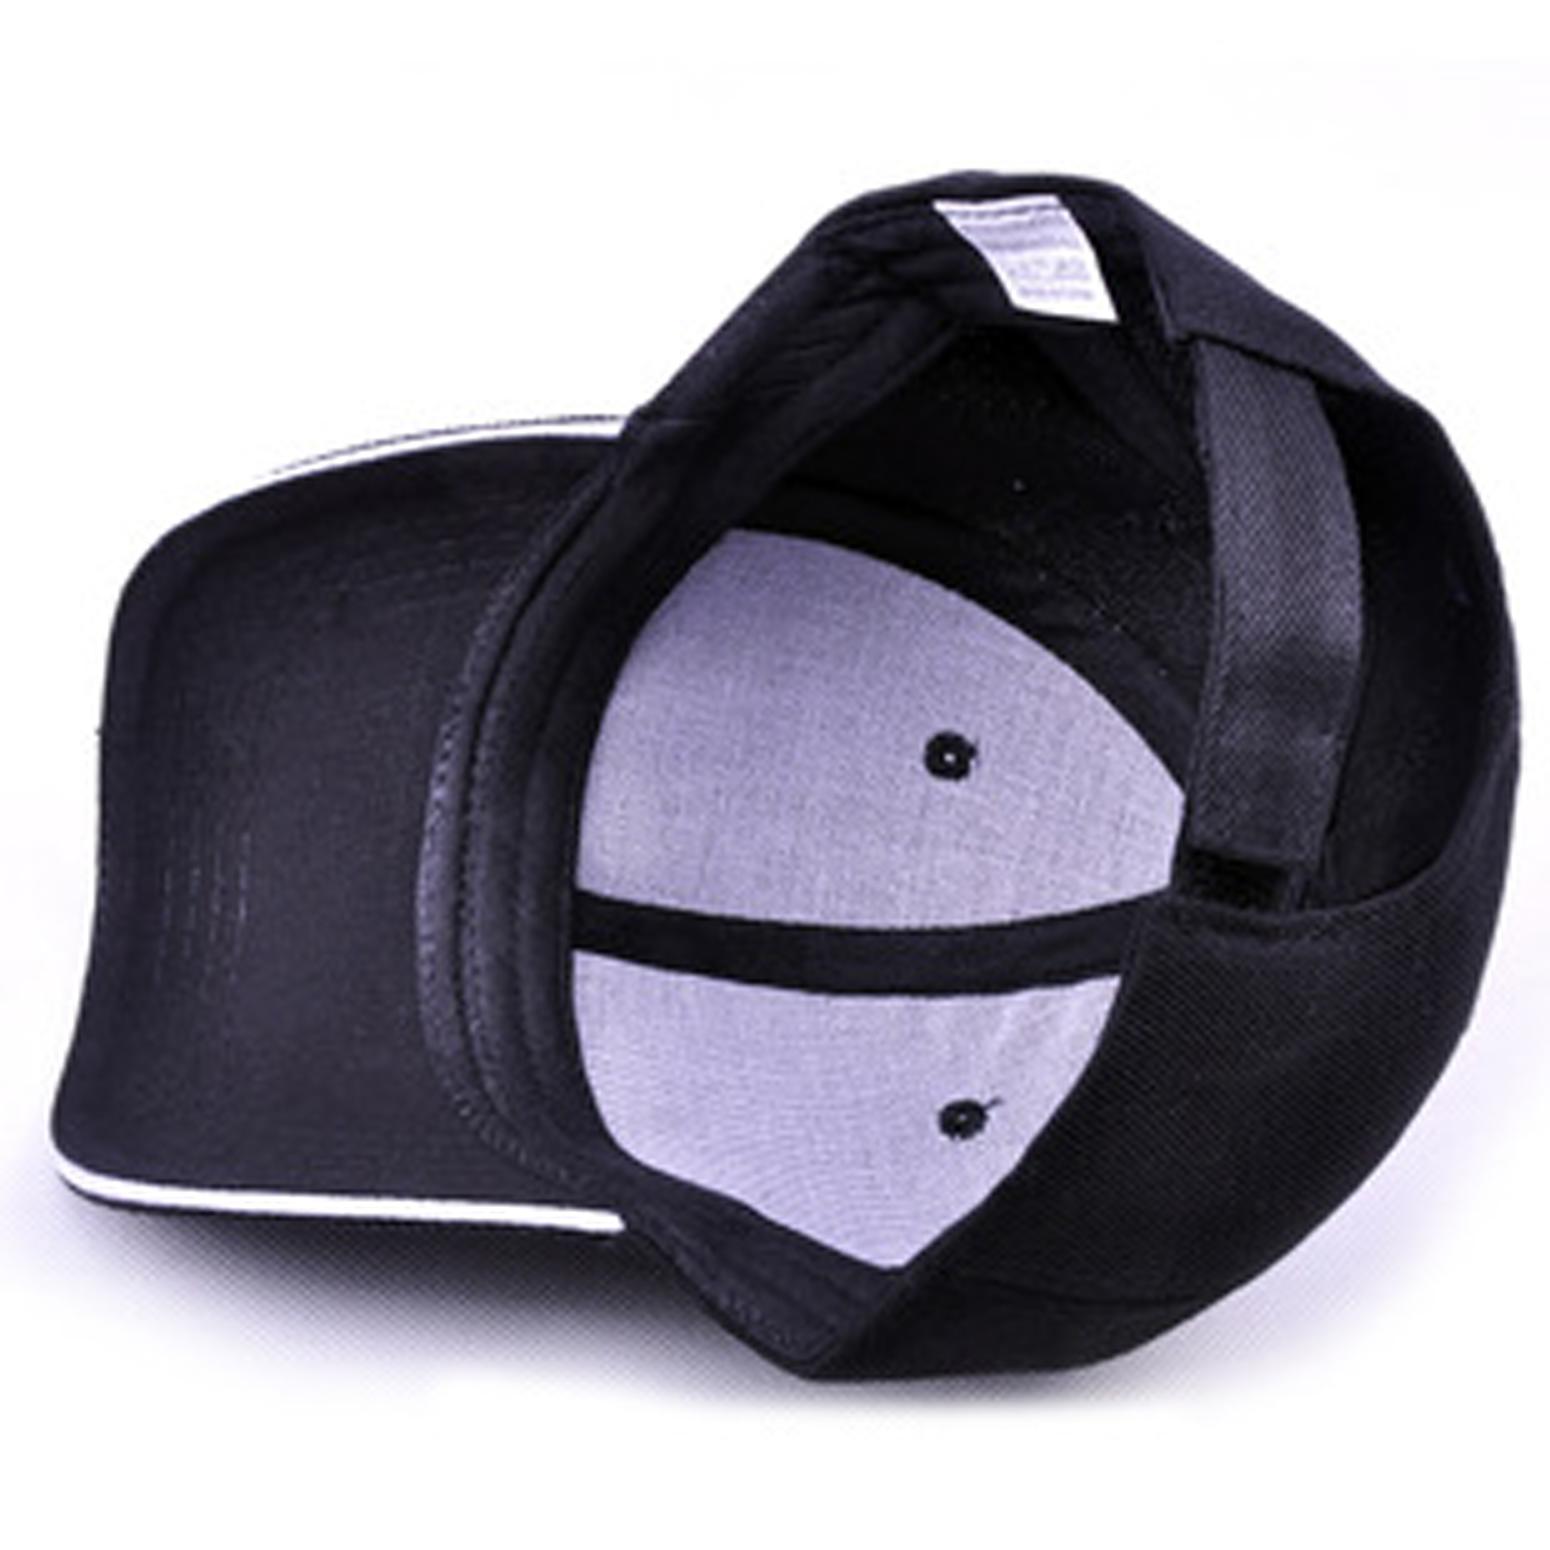 a8ddf89d34d2f Resident Evil Umbrella Corporation Flocking Adjustable Baseball Cap ...